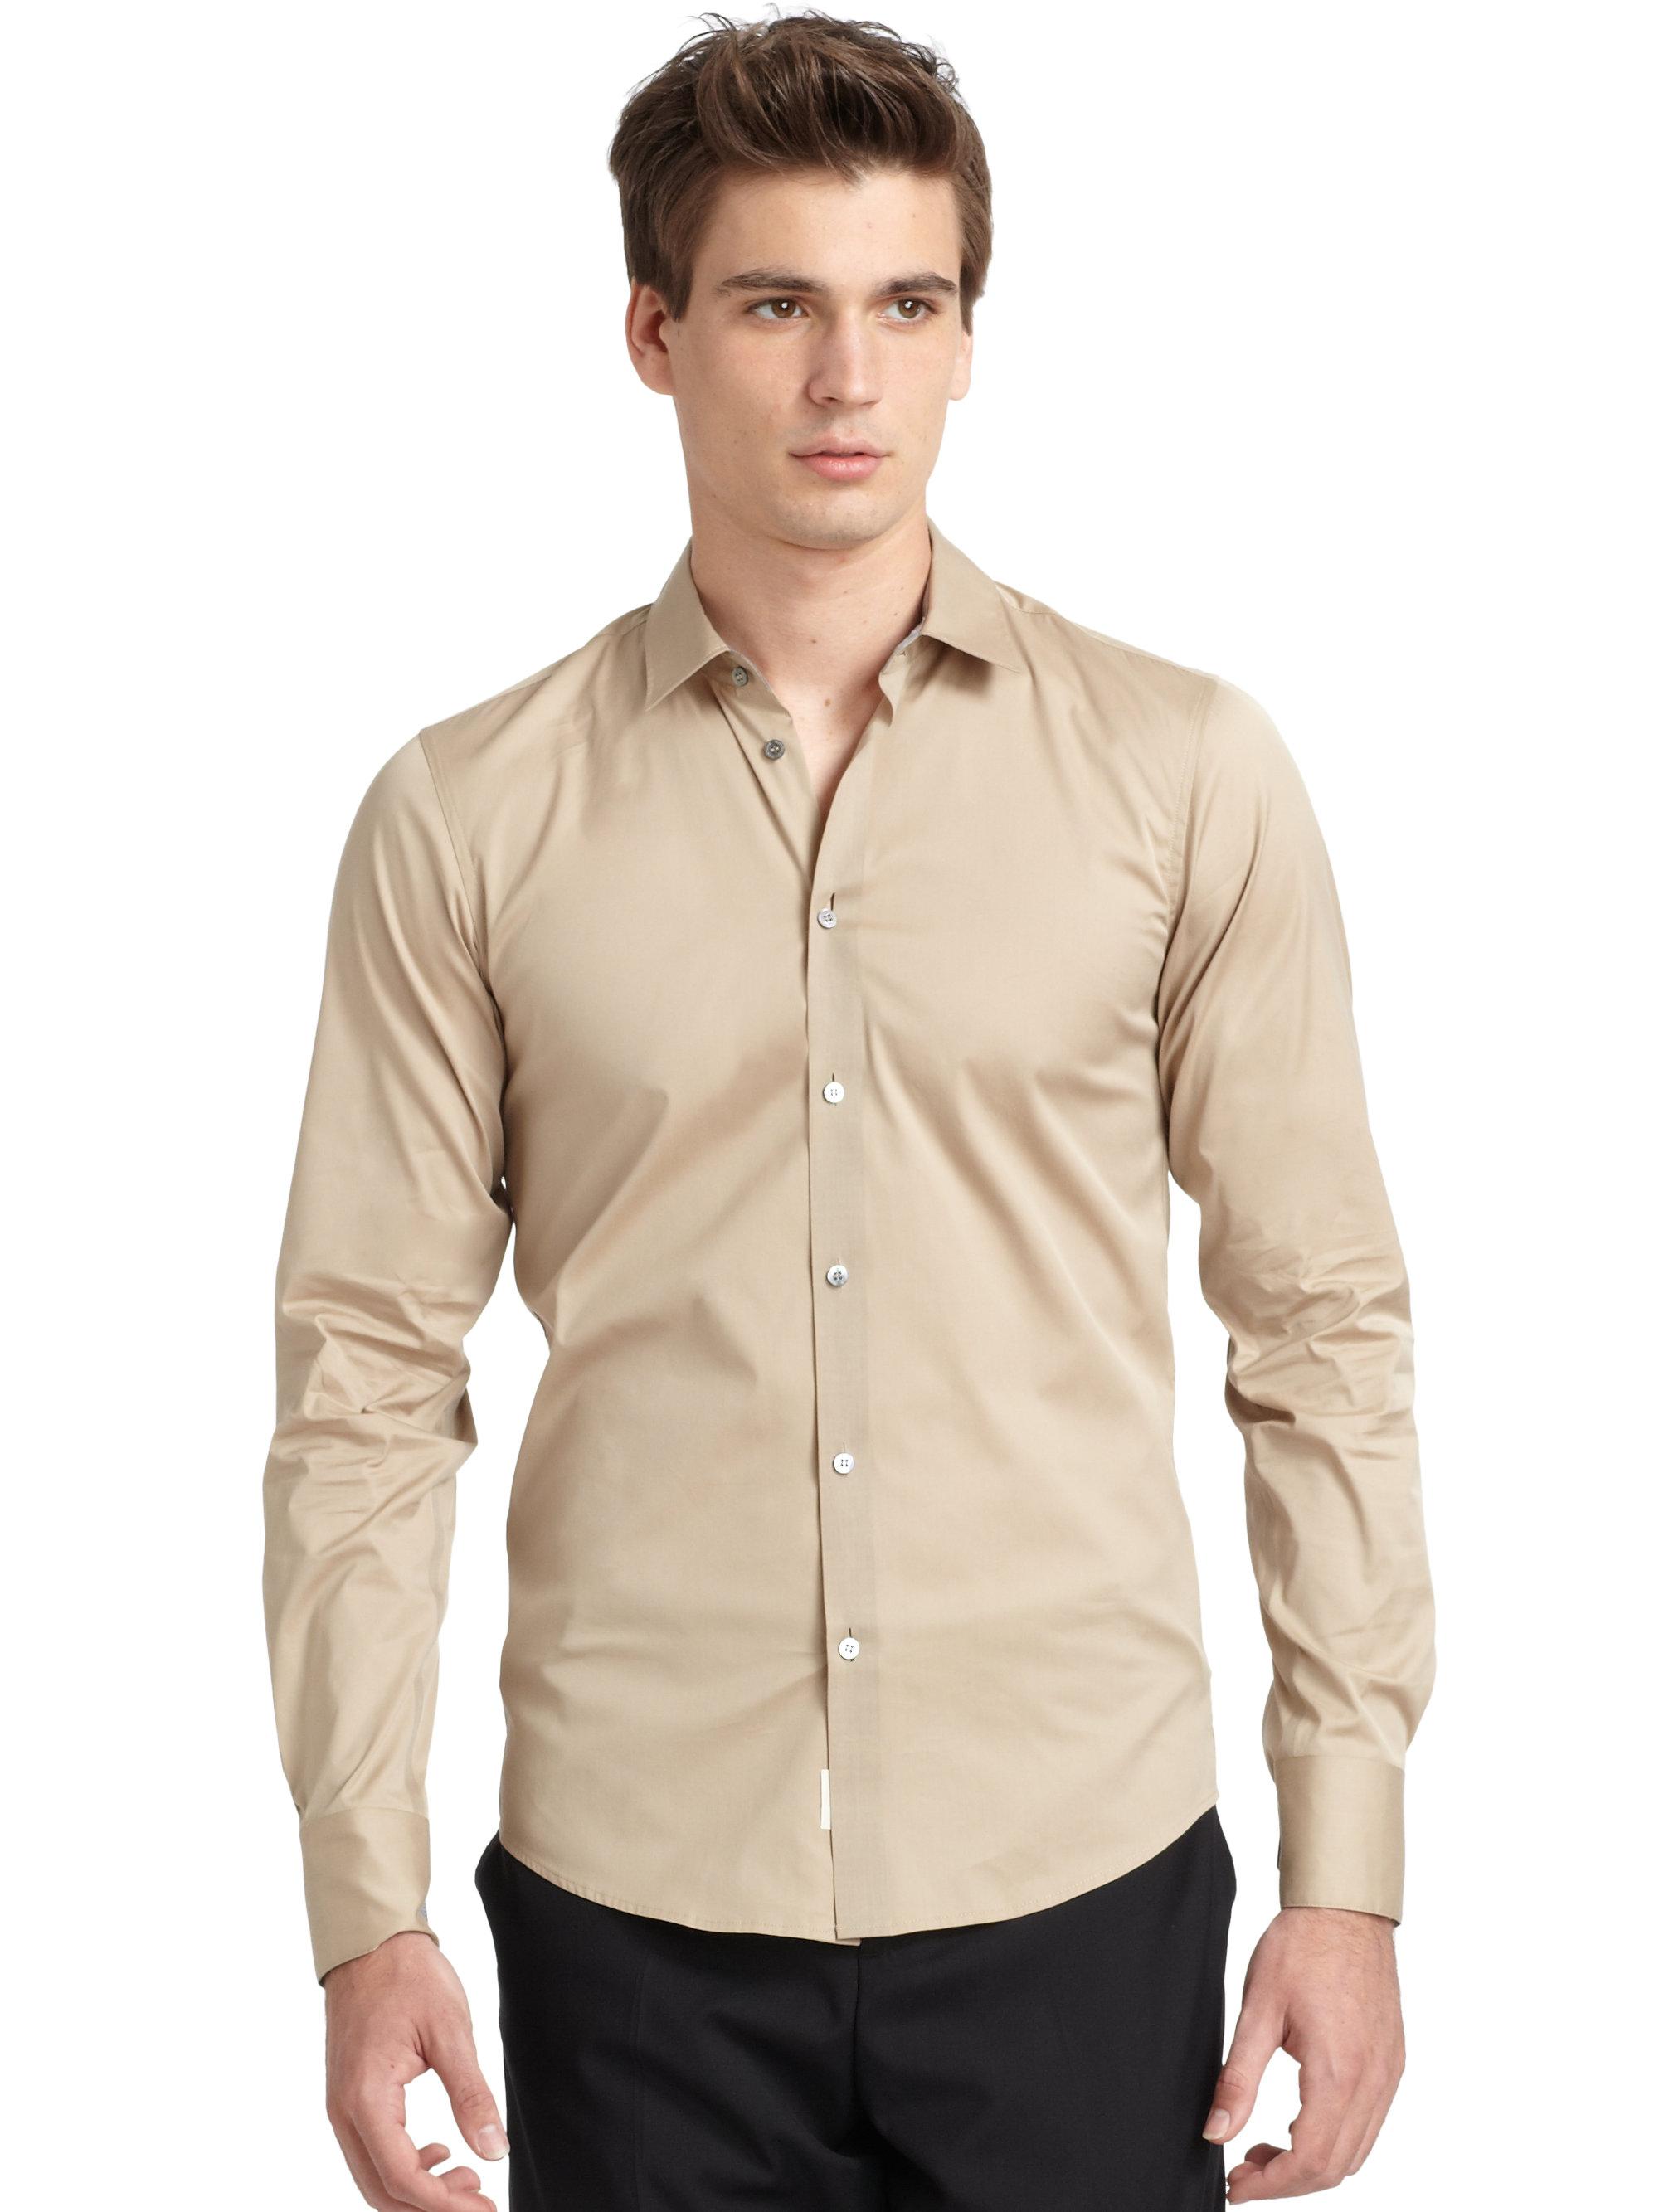 Tan Button Down Shirt | Artee Shirt